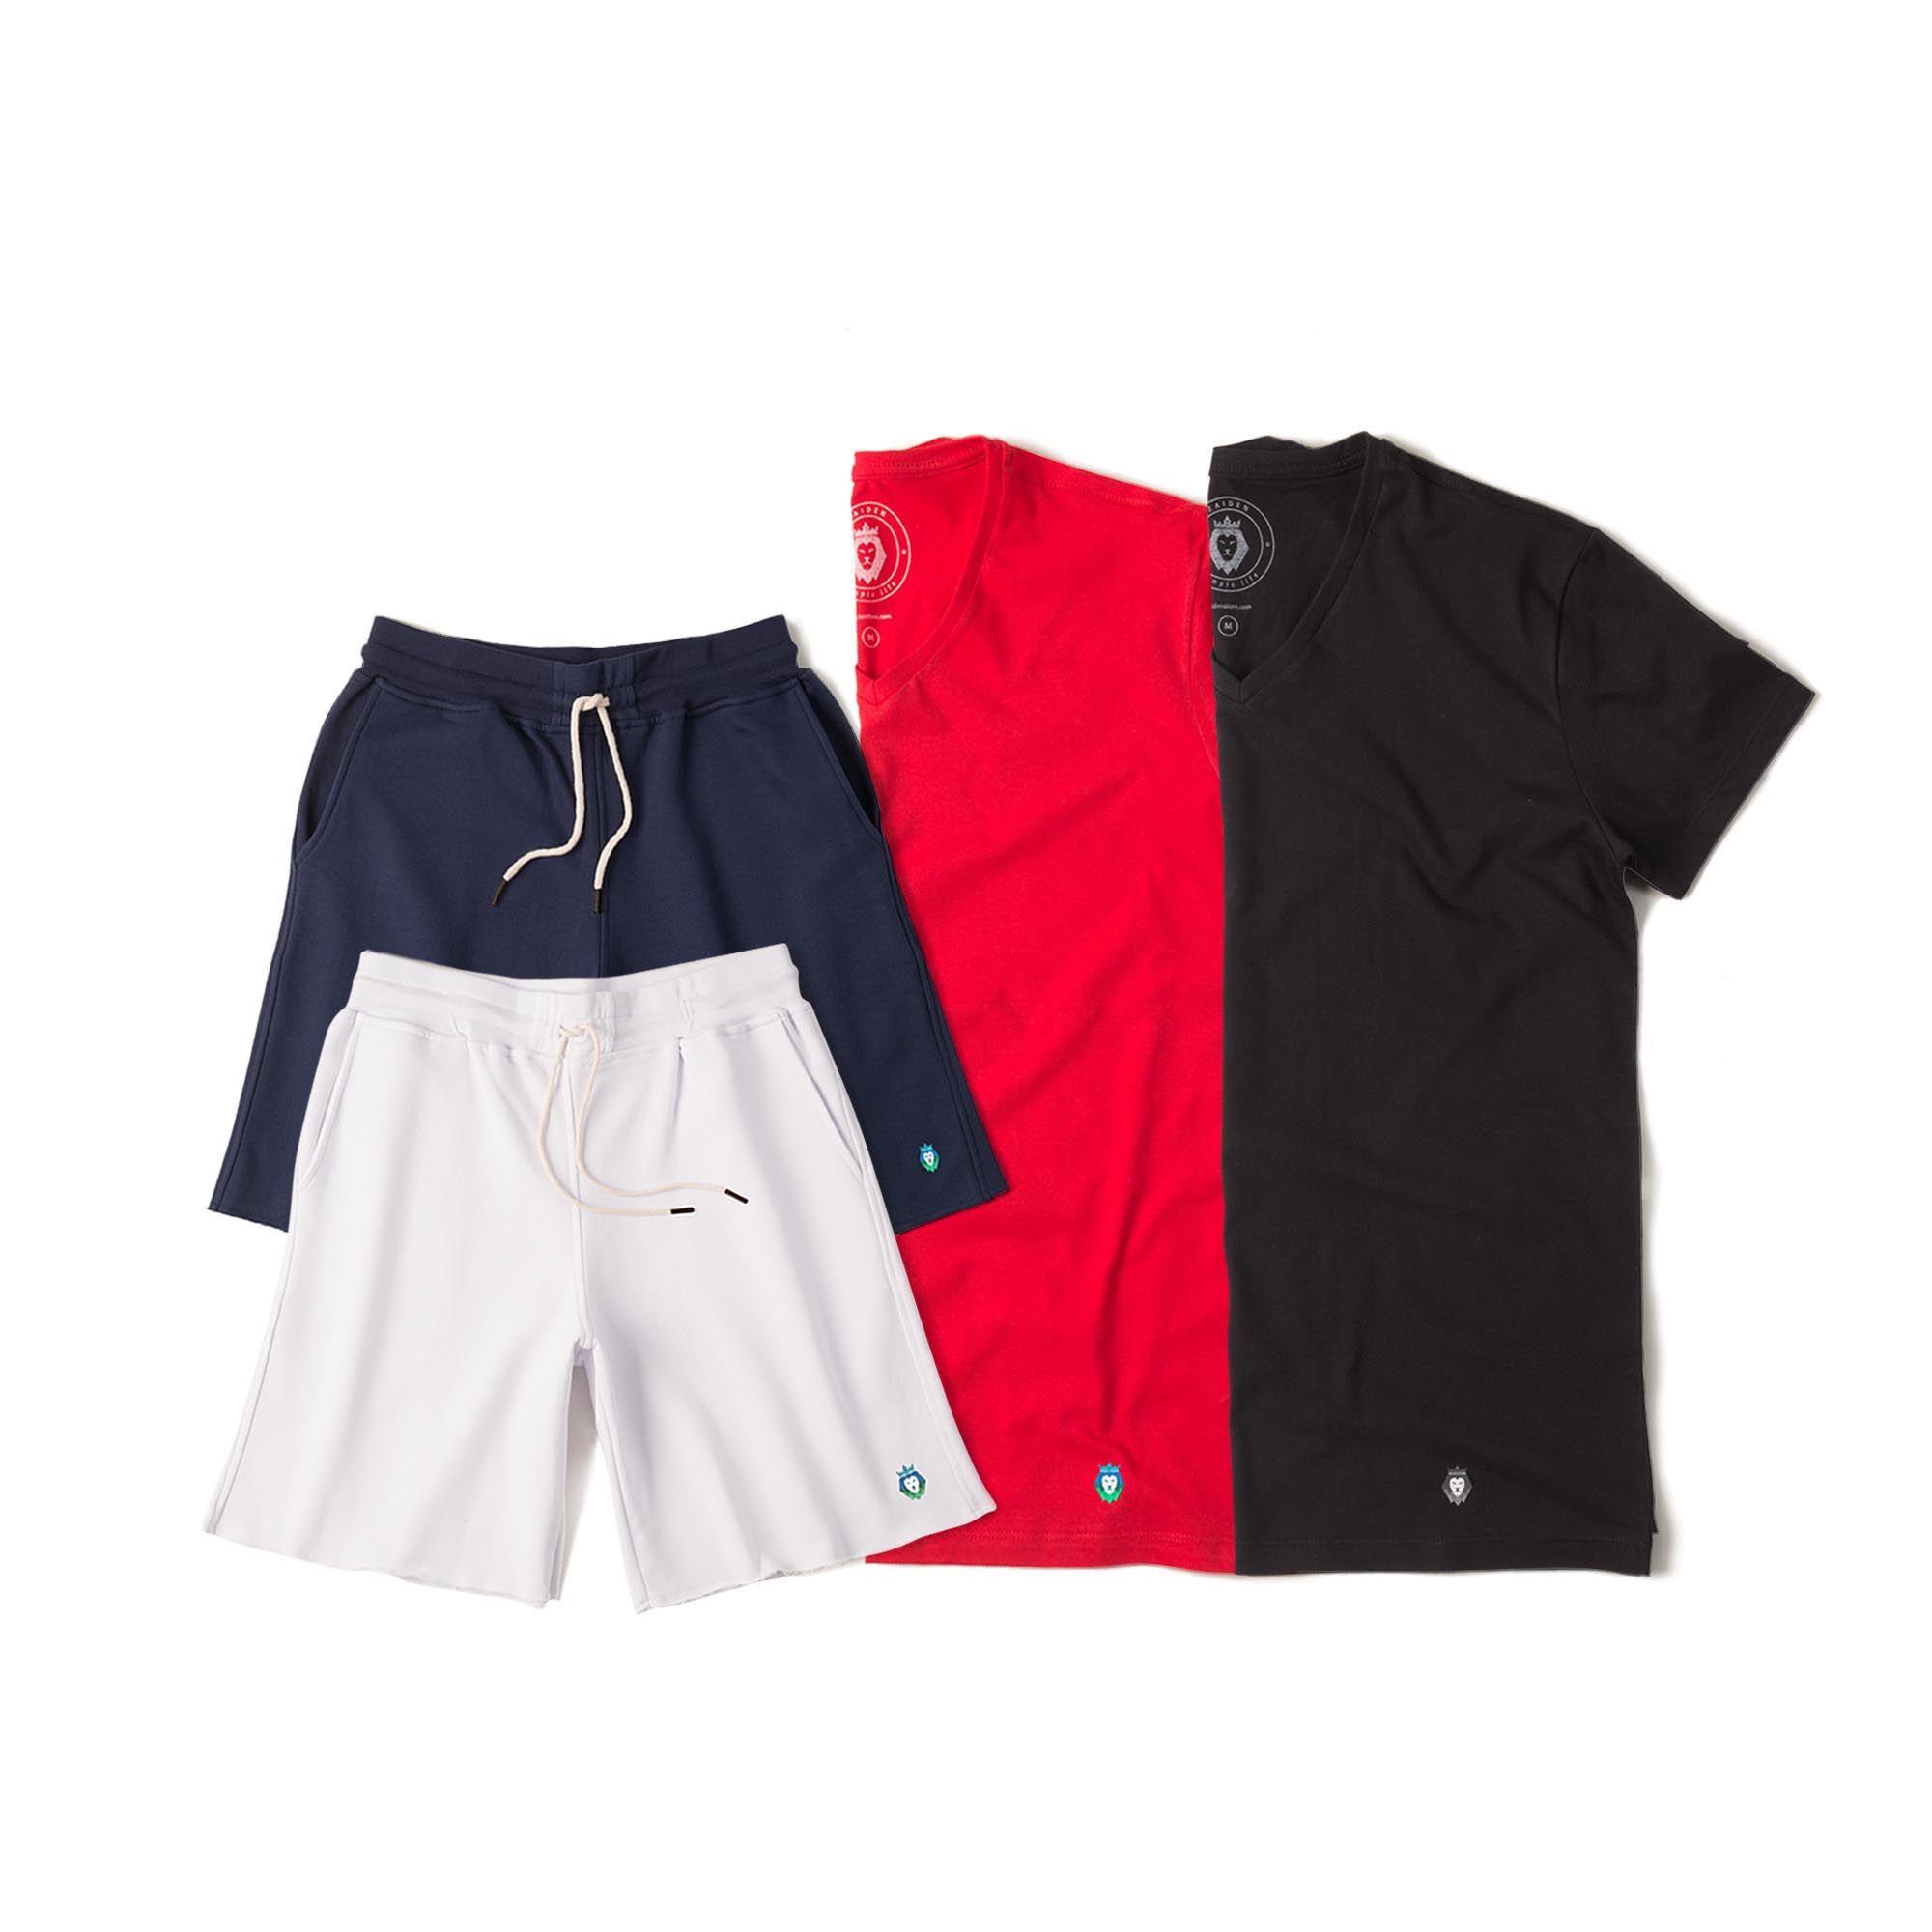 Kit 2 Bermudas Basic Azul Marinho Branca + 2 T-Shirts Basic Preta Vermelha Zaiden Masculina